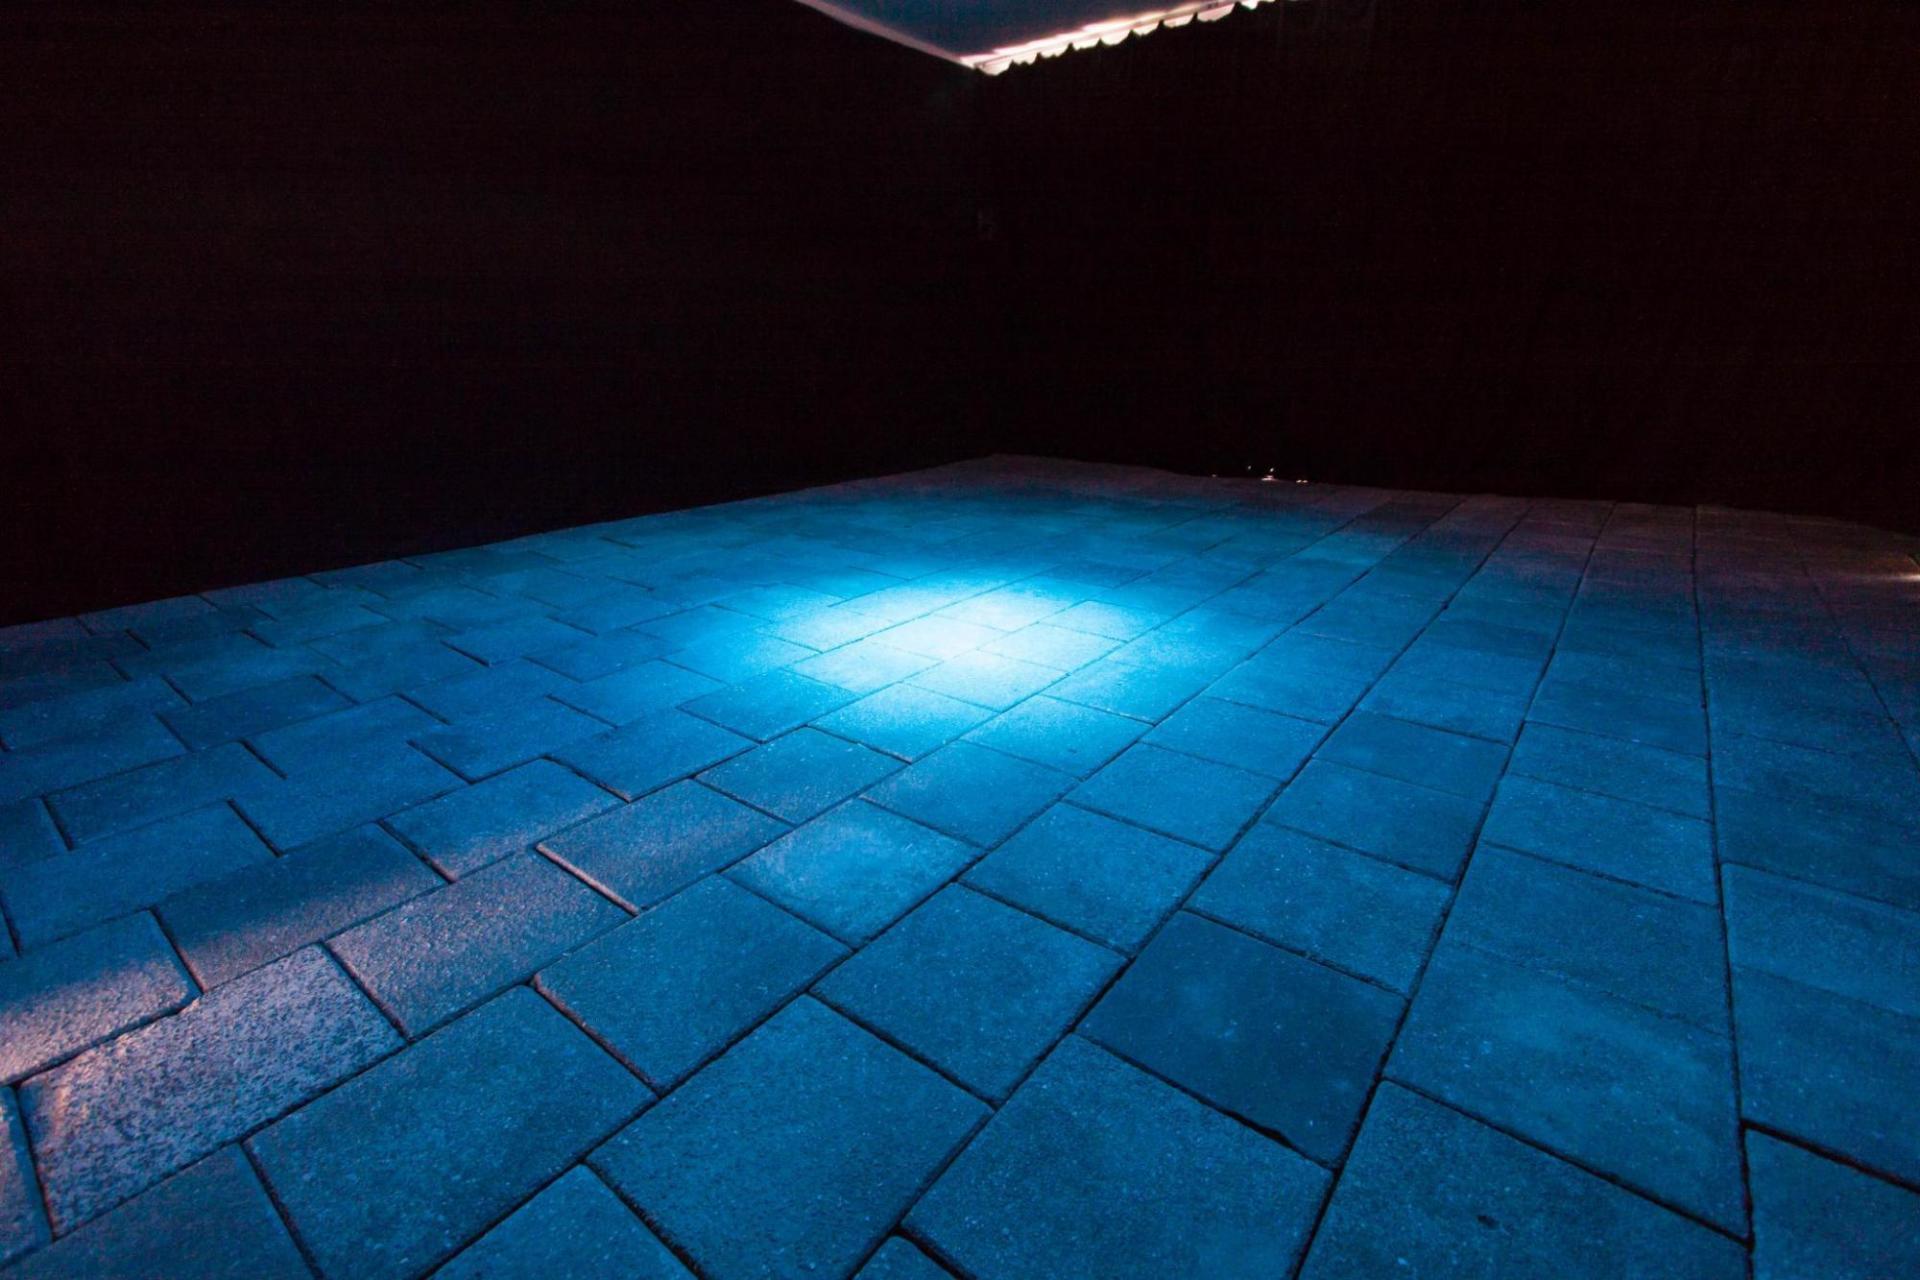 © Alex Smorenberg en Dennis Neumann - ruimtevullende installatie met geluis en beeld